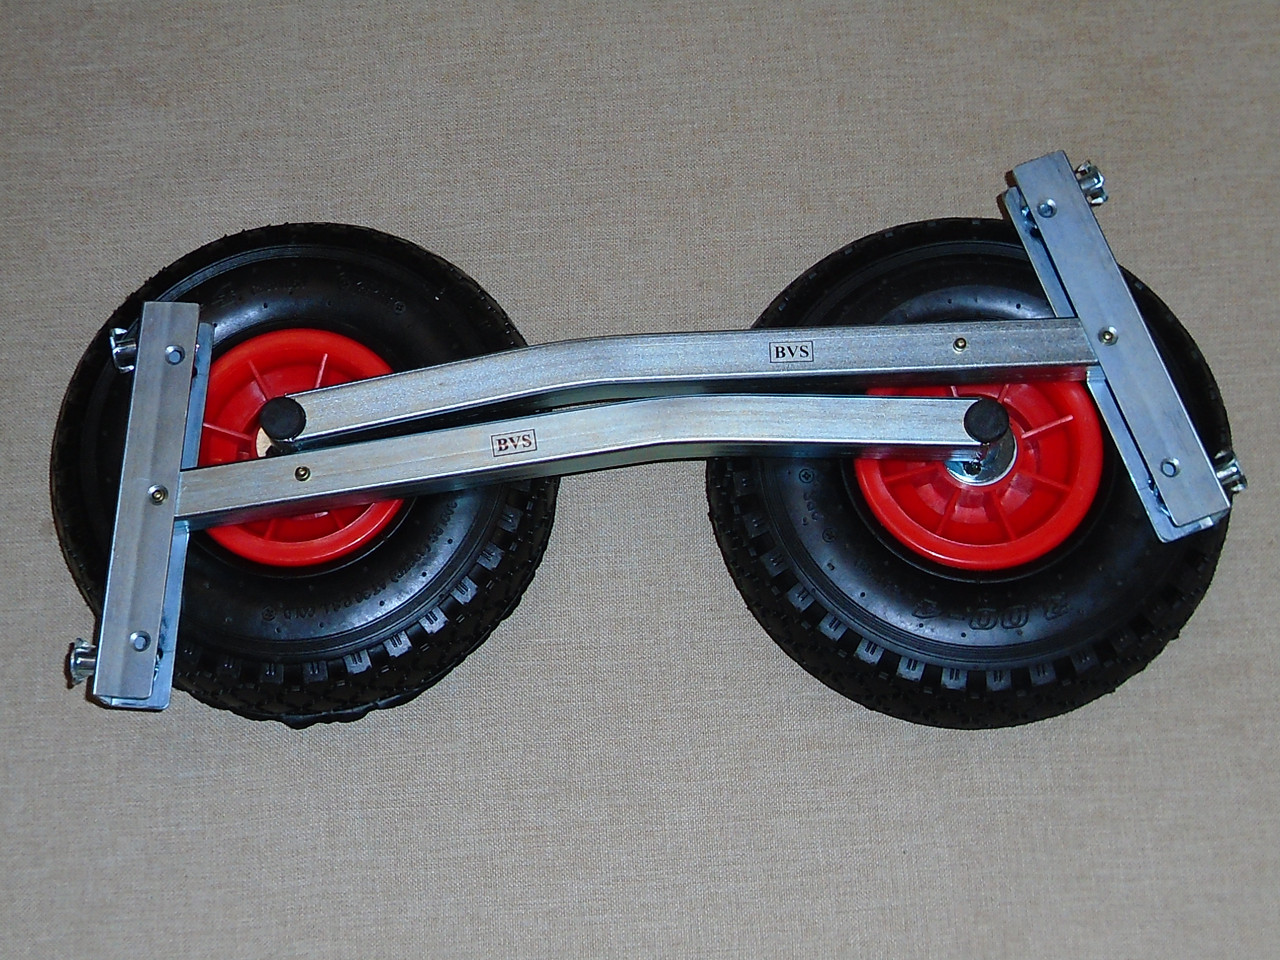 Транцевые колеса BVS КТ400 Кнопка Base